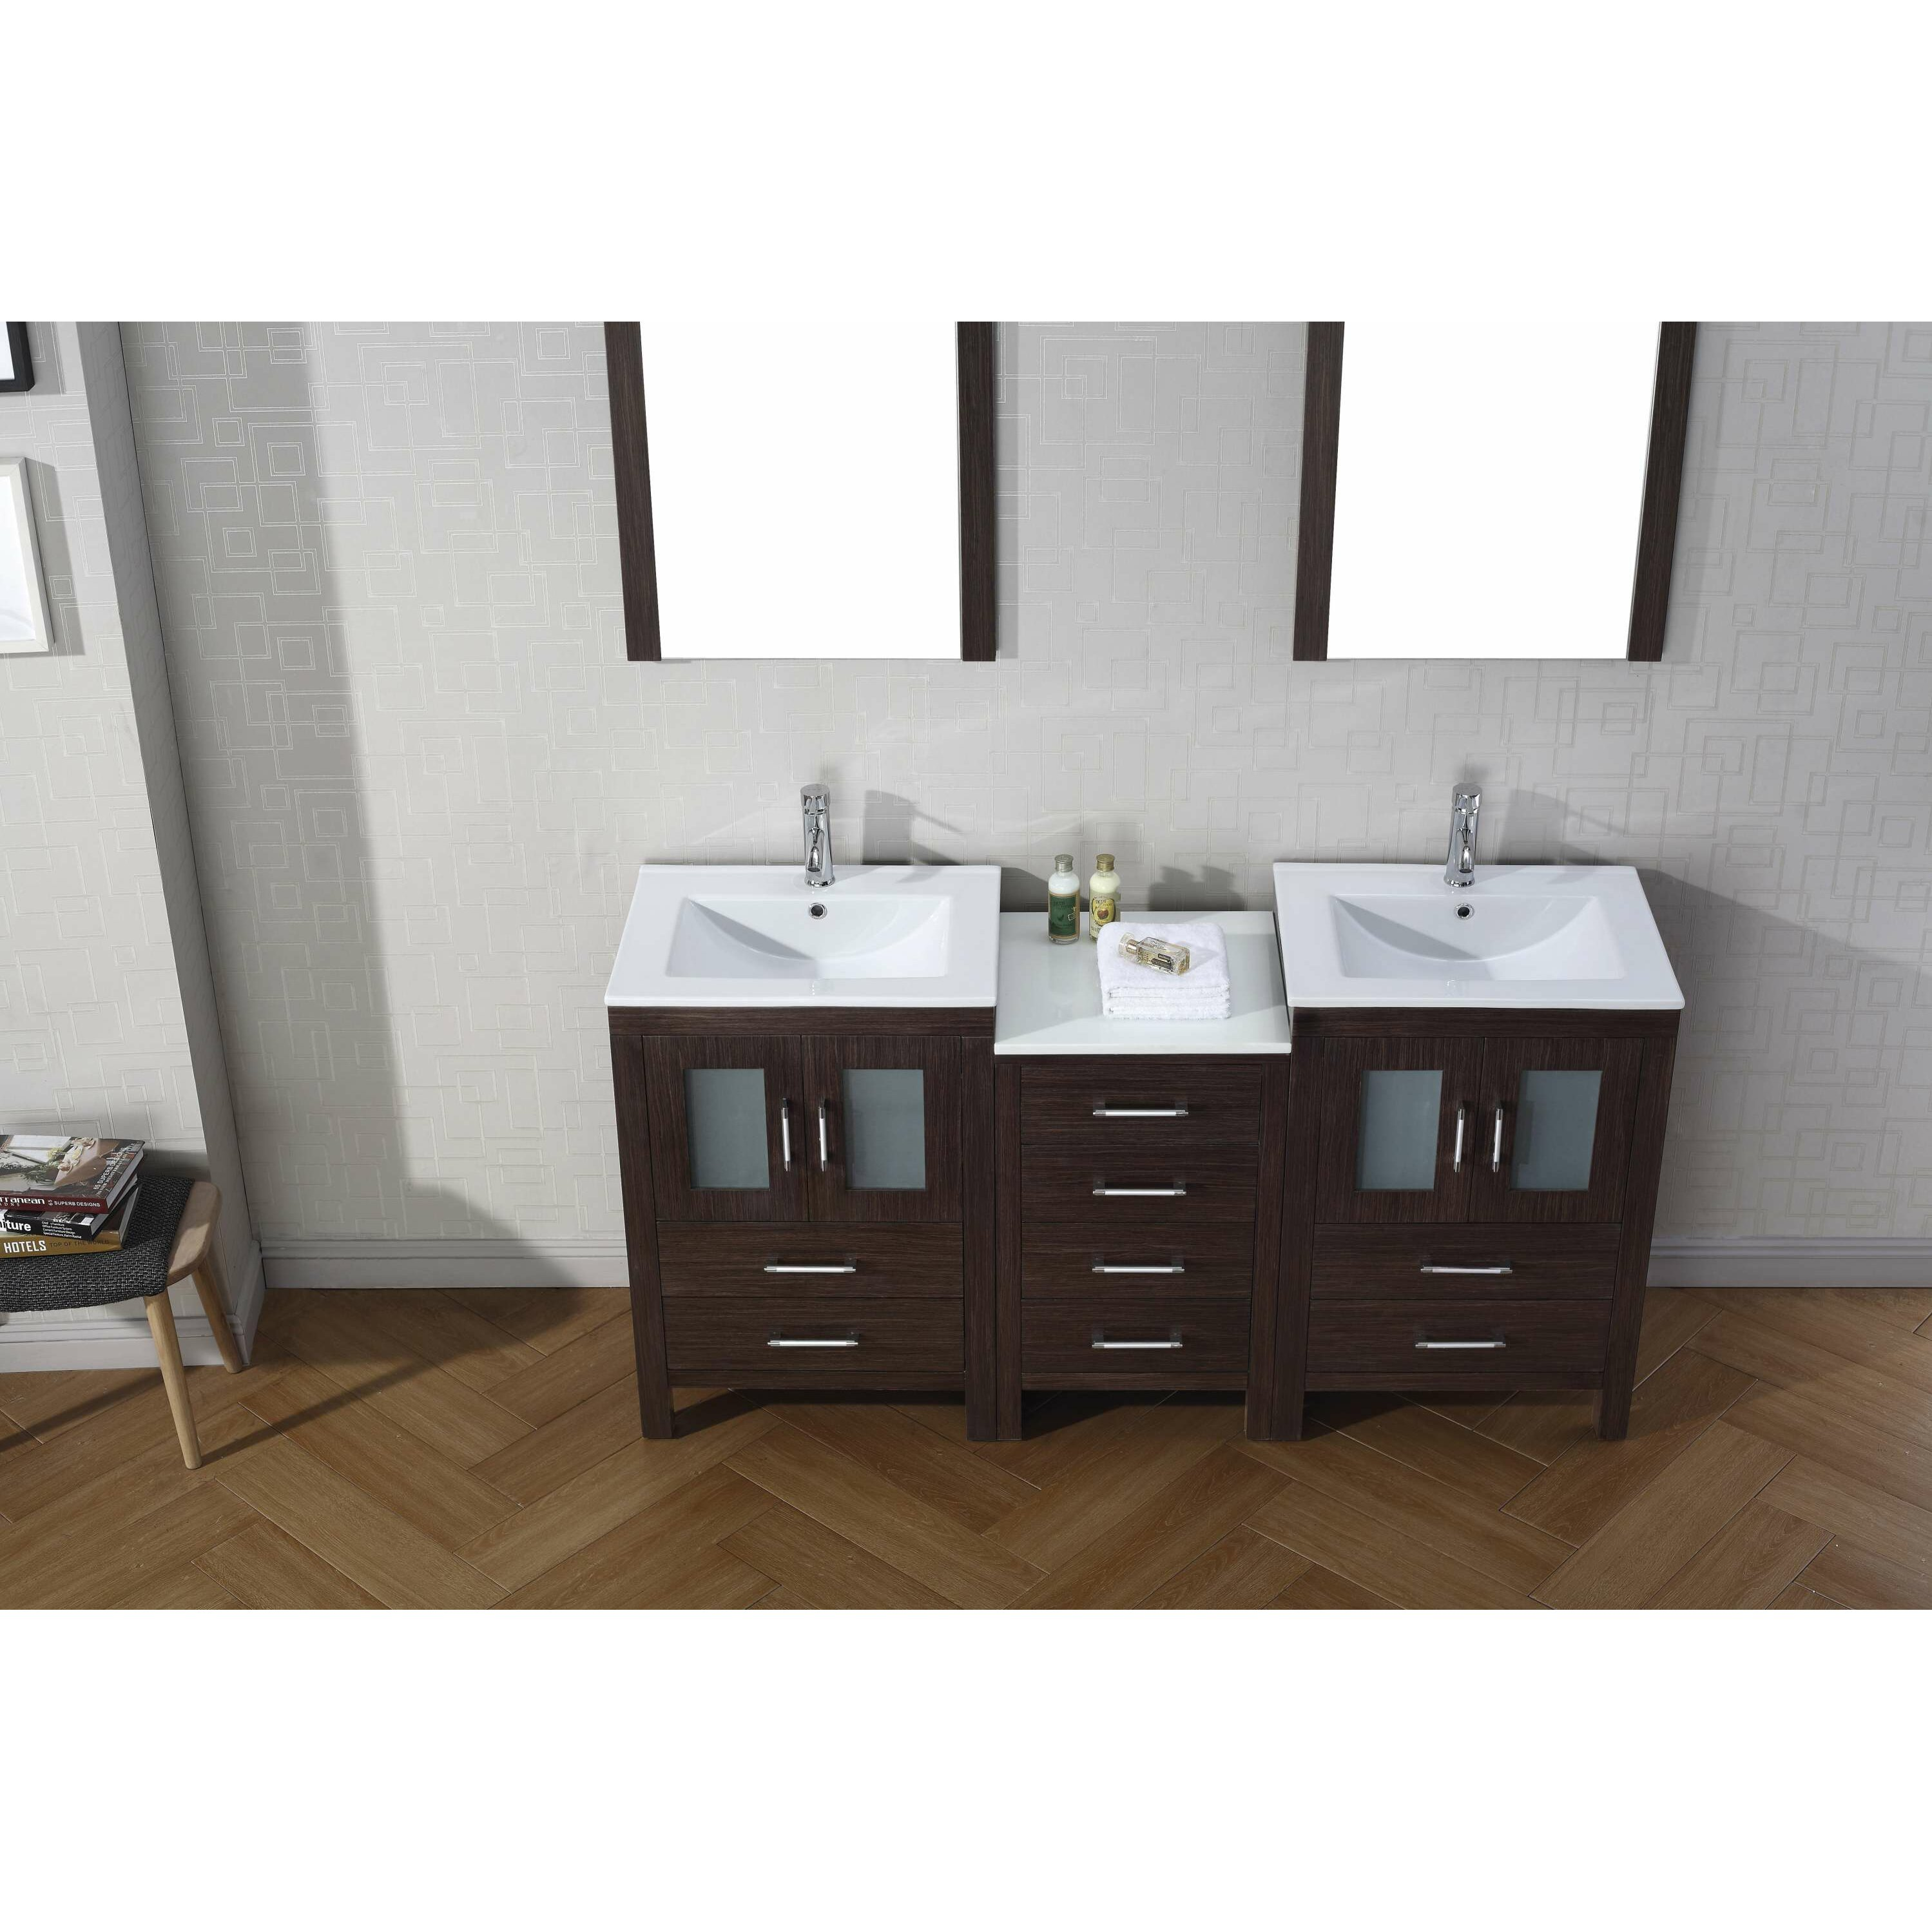 Virtu Dior 66 Double Bathroom Vanity Set With Mirror Reviews Wa